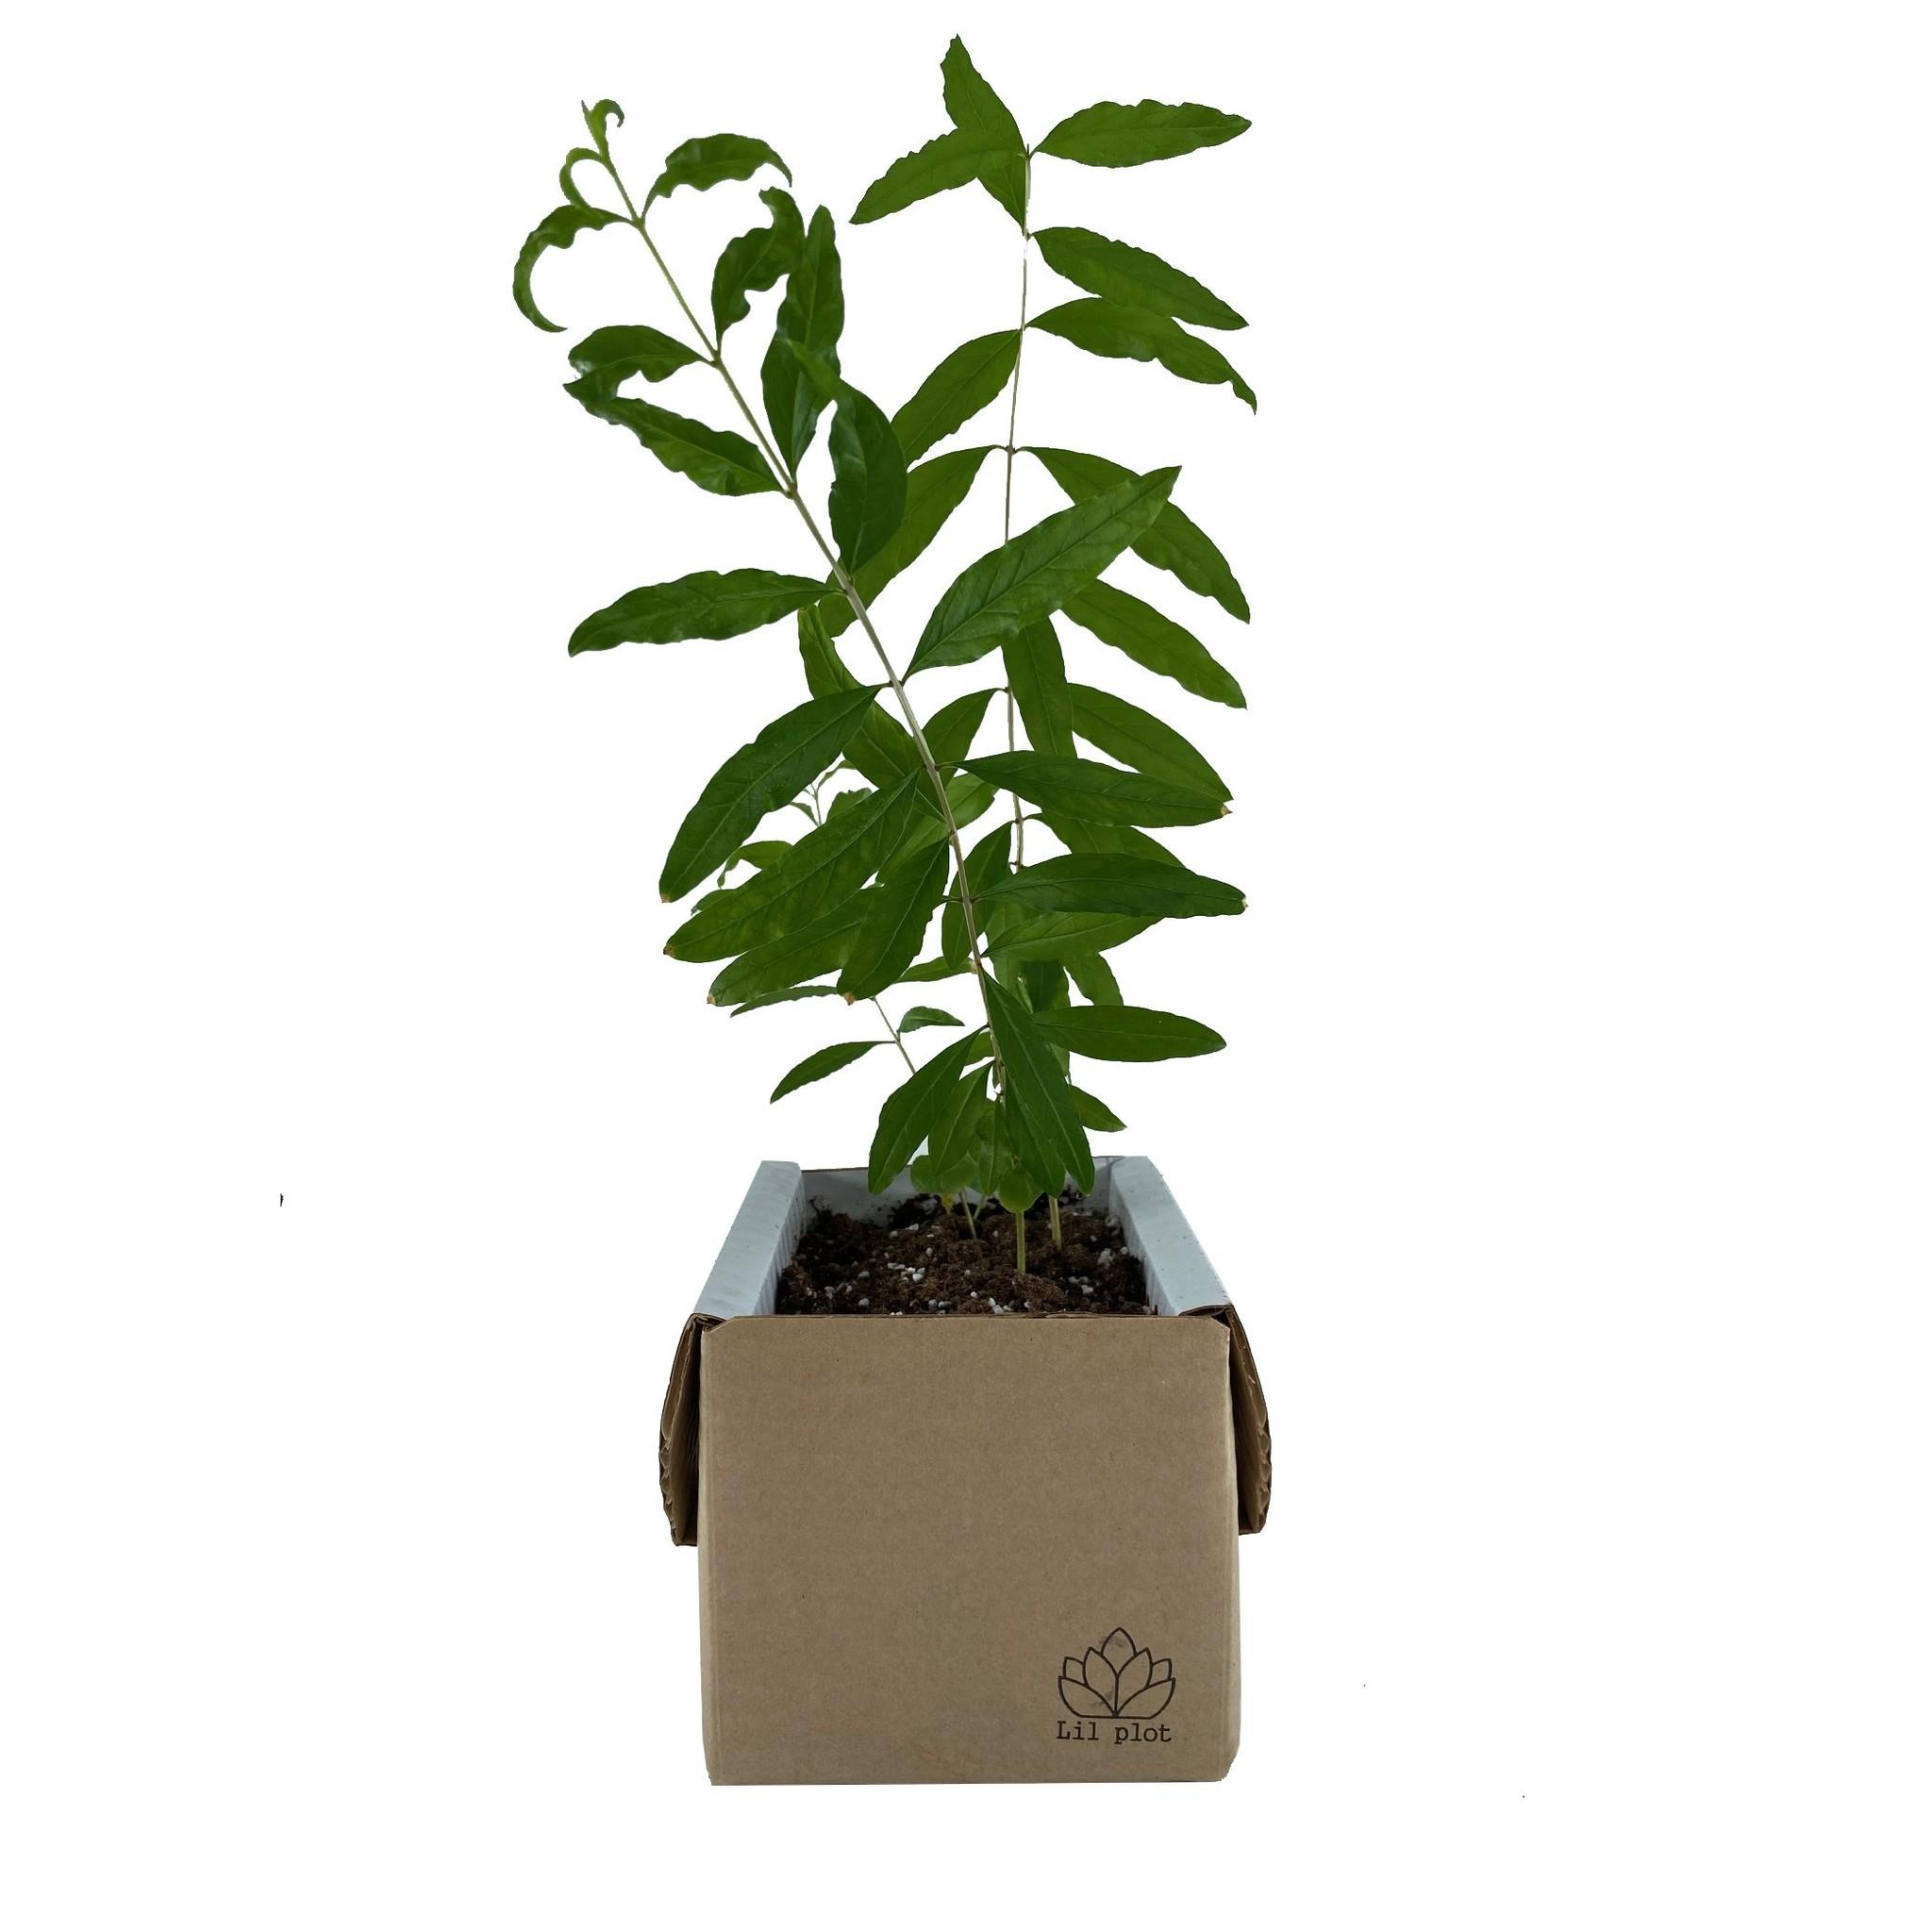 Pomegranate Tree Growing Kit